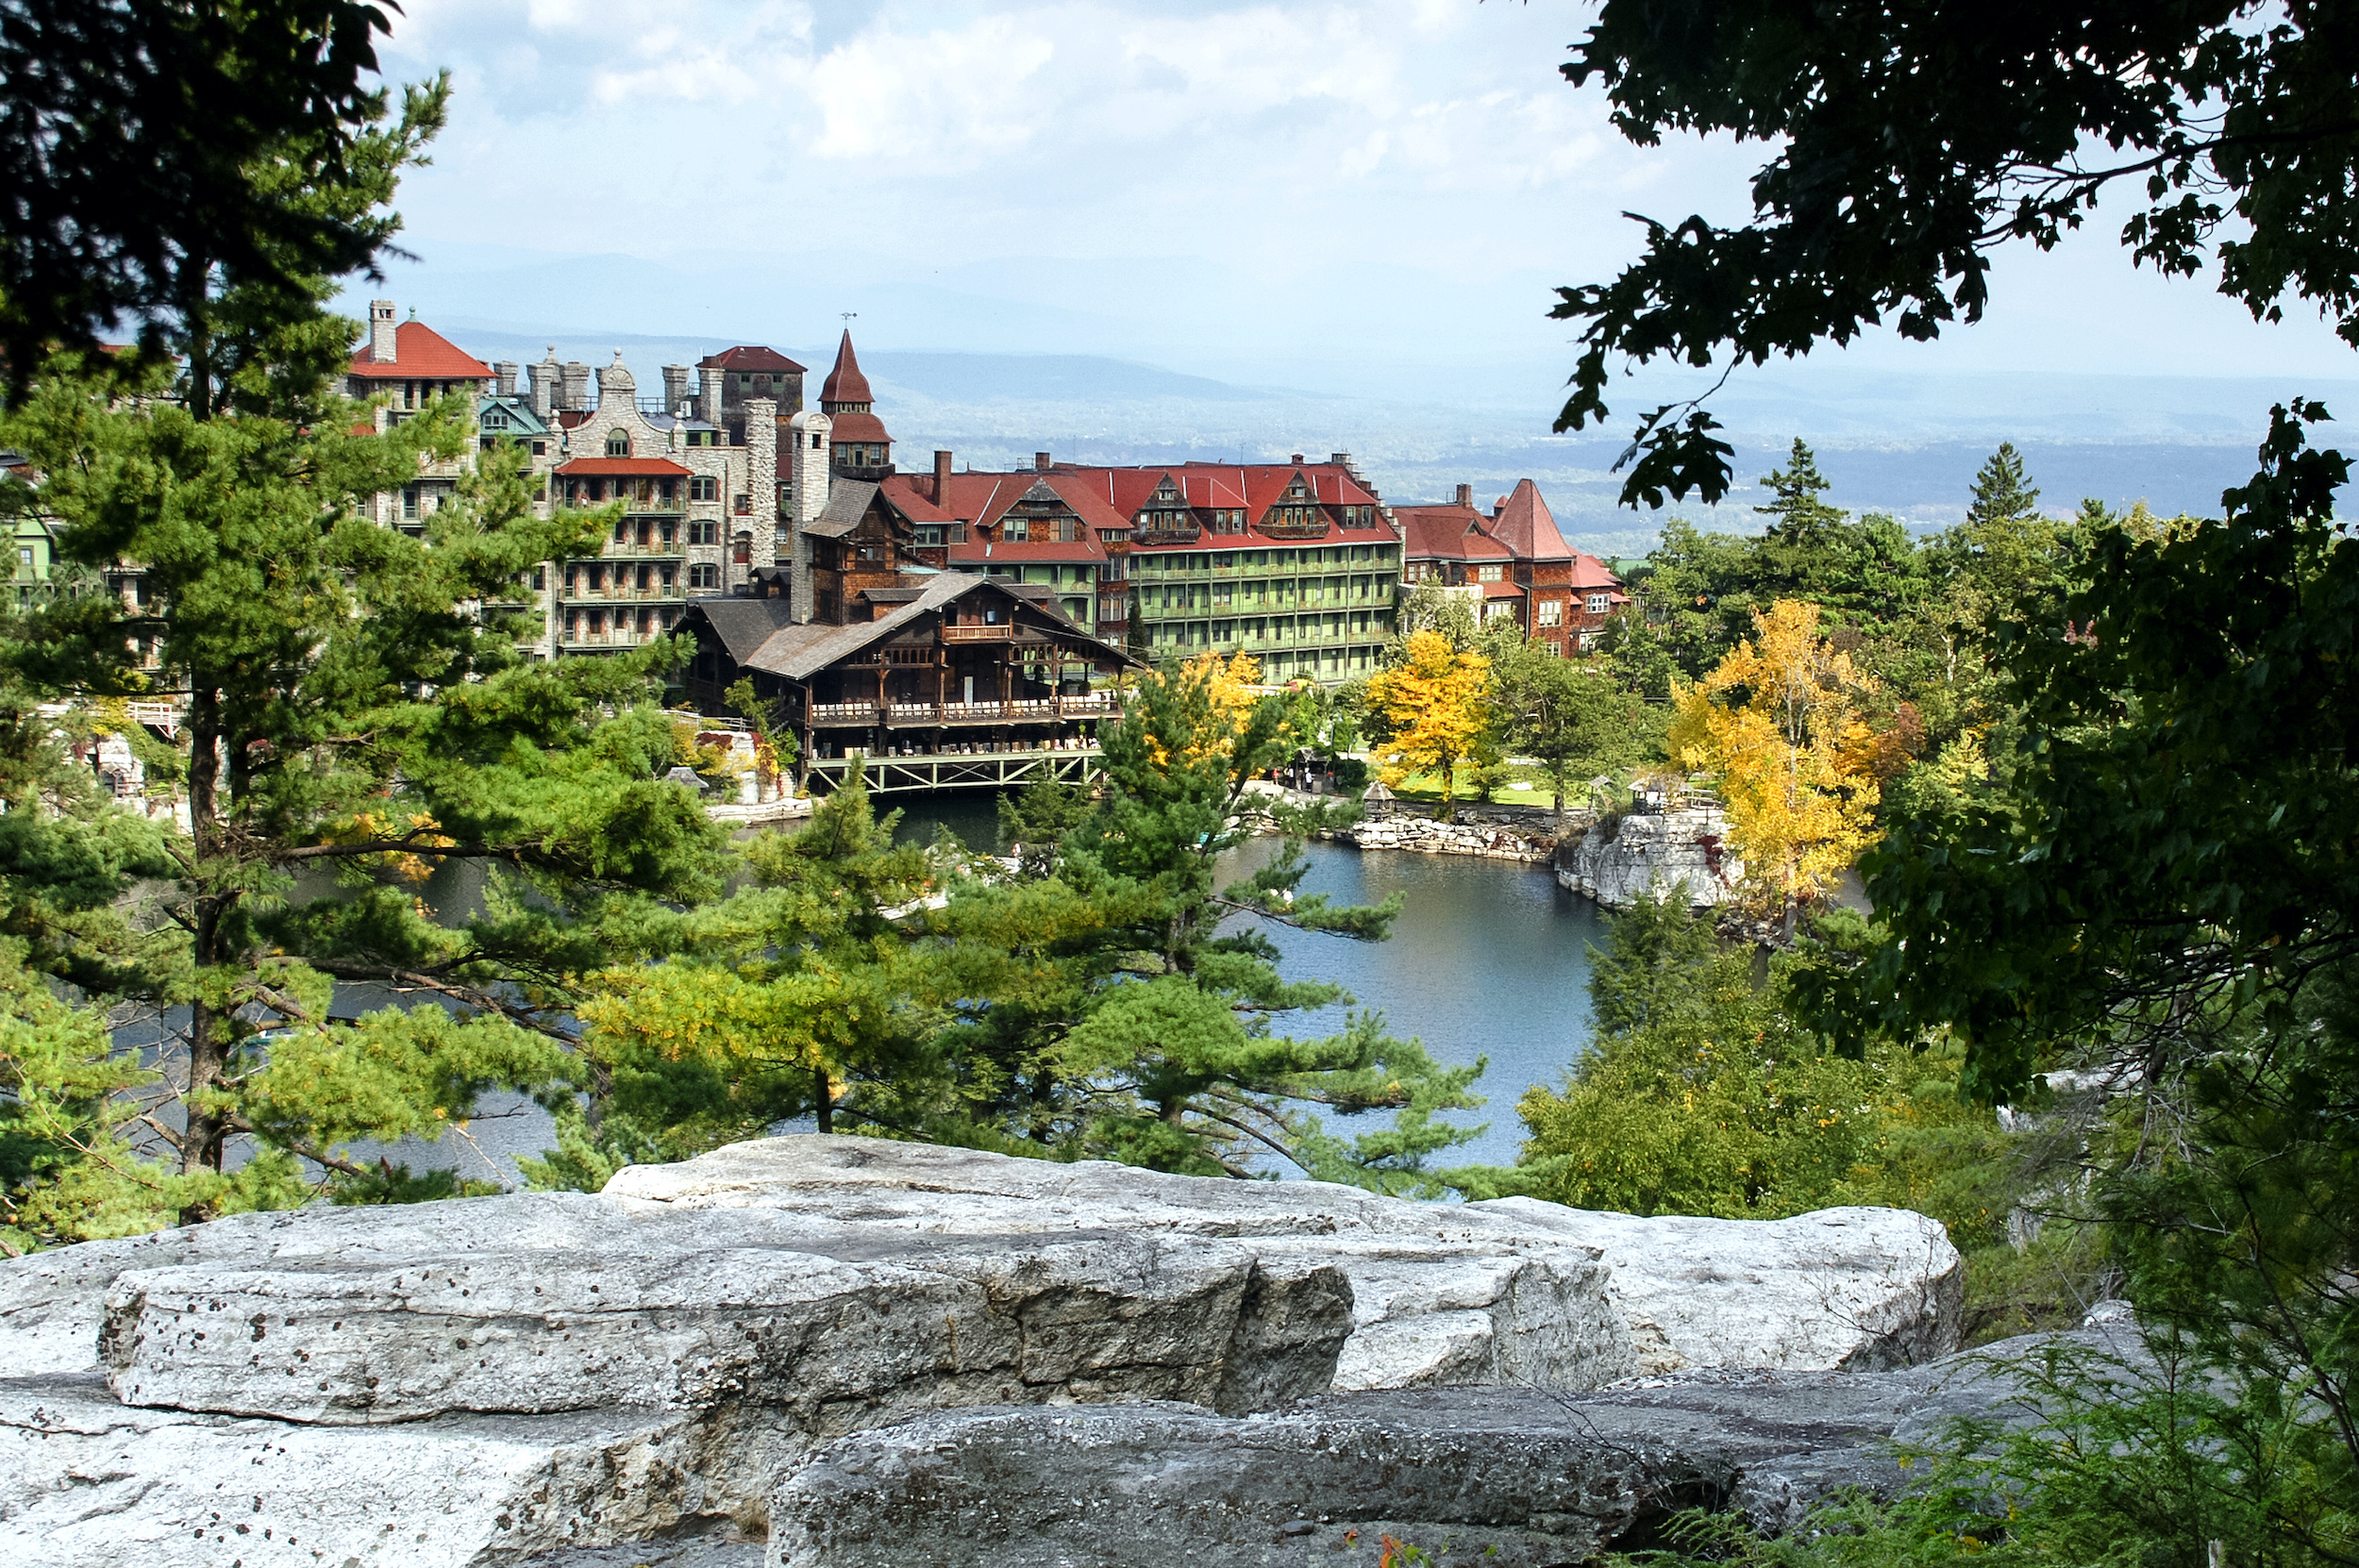 vacation rental income catskills new york large property lake